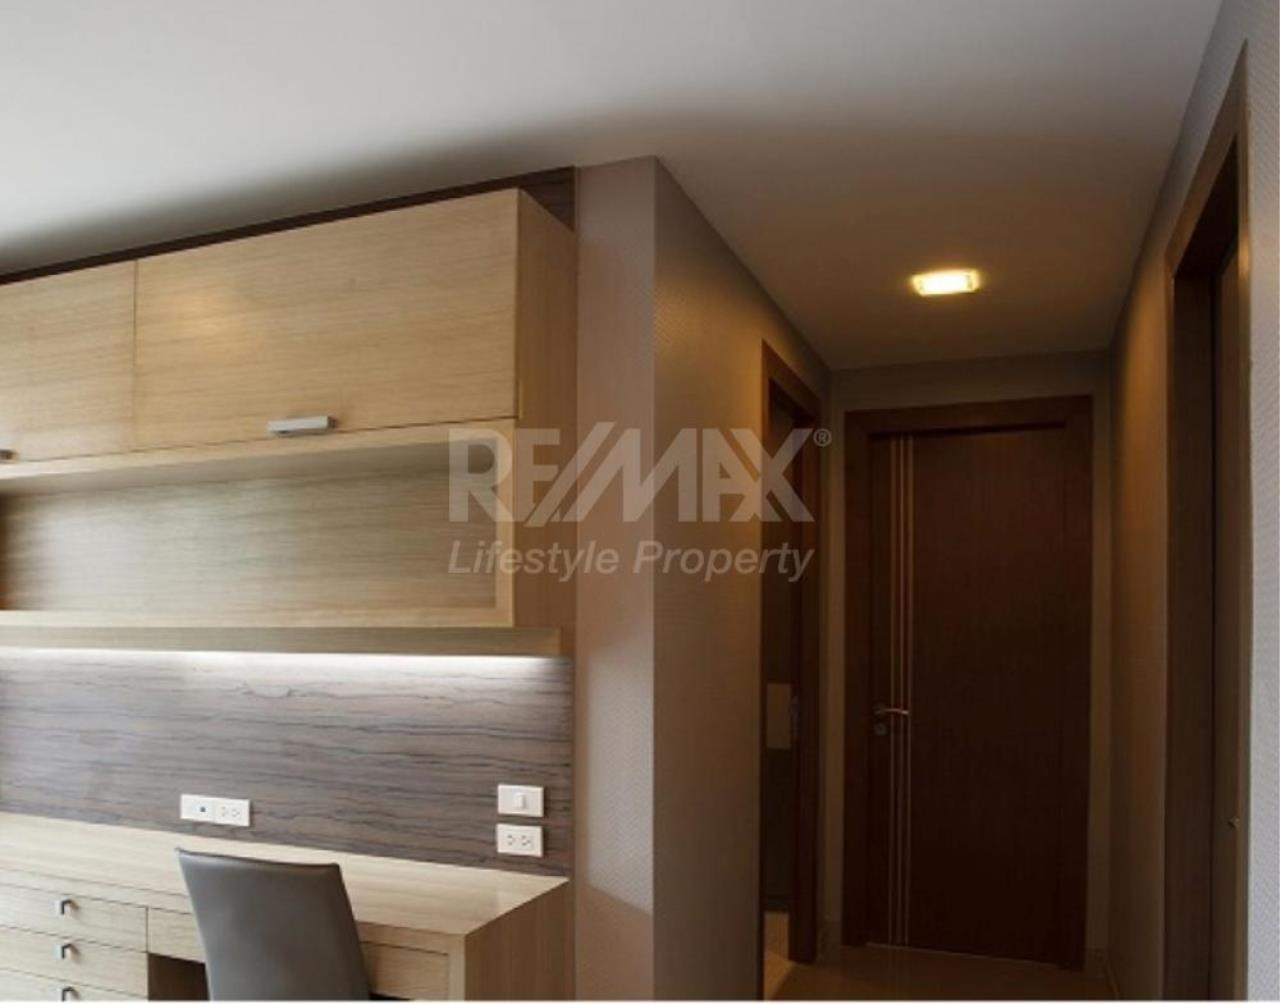 RE/MAX LifeStyle Property Agency's Fernwood Residence 7